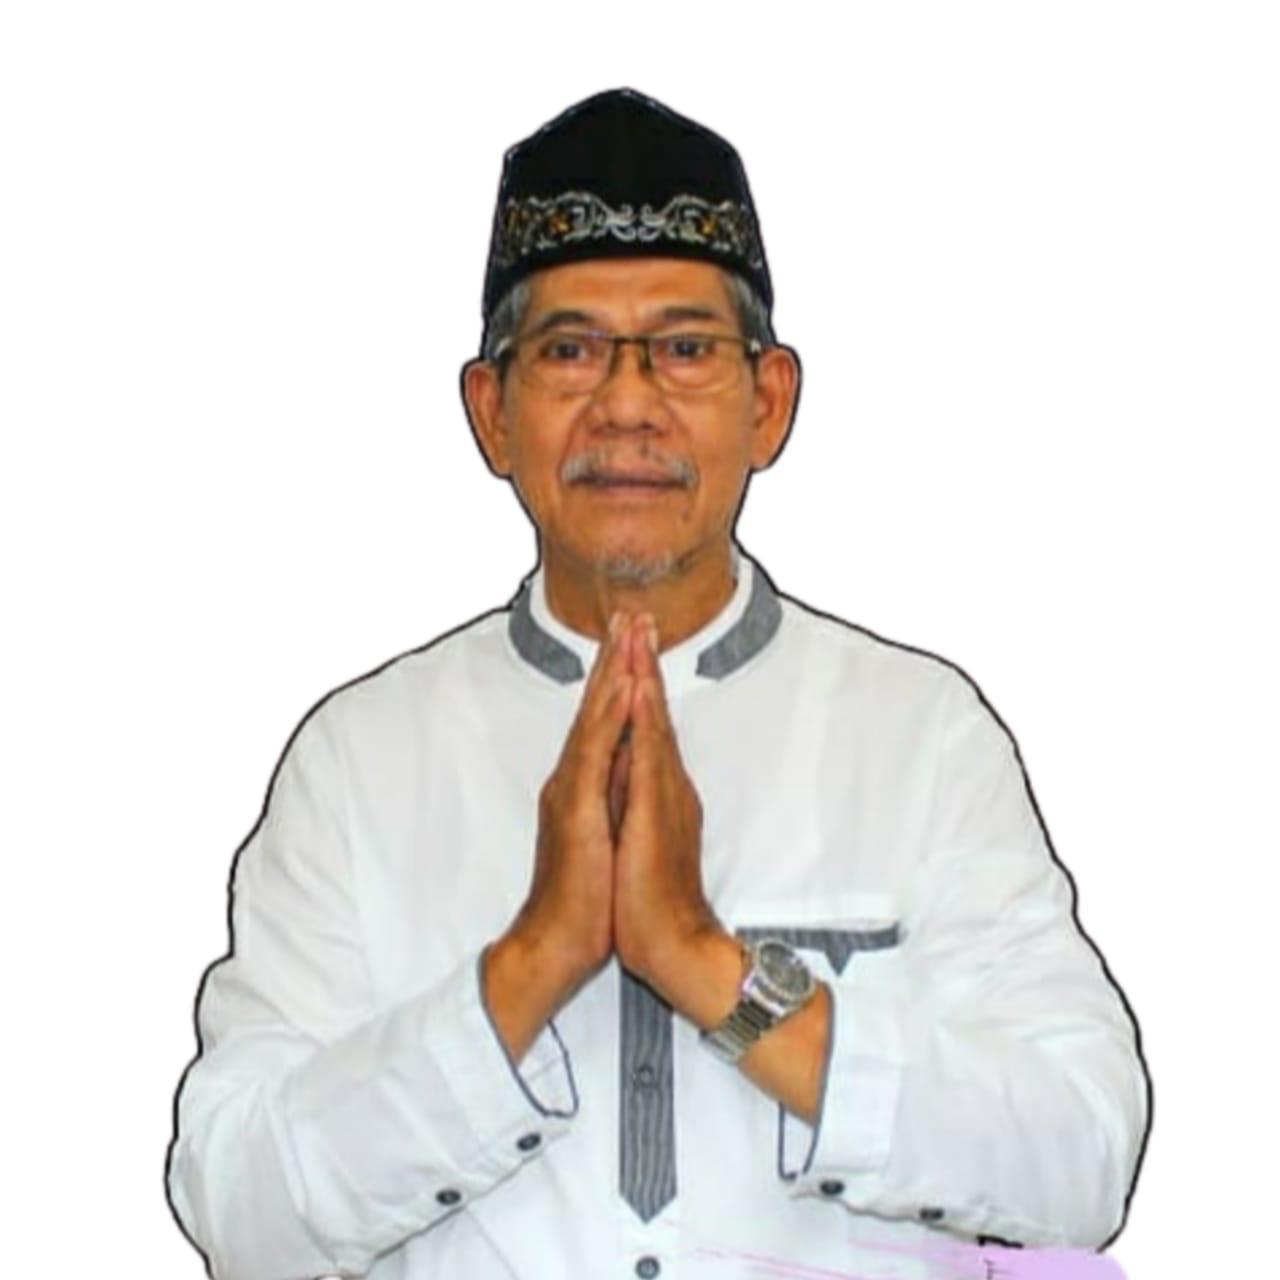 budi utomo rektor universitas muhammadiyah lamongan